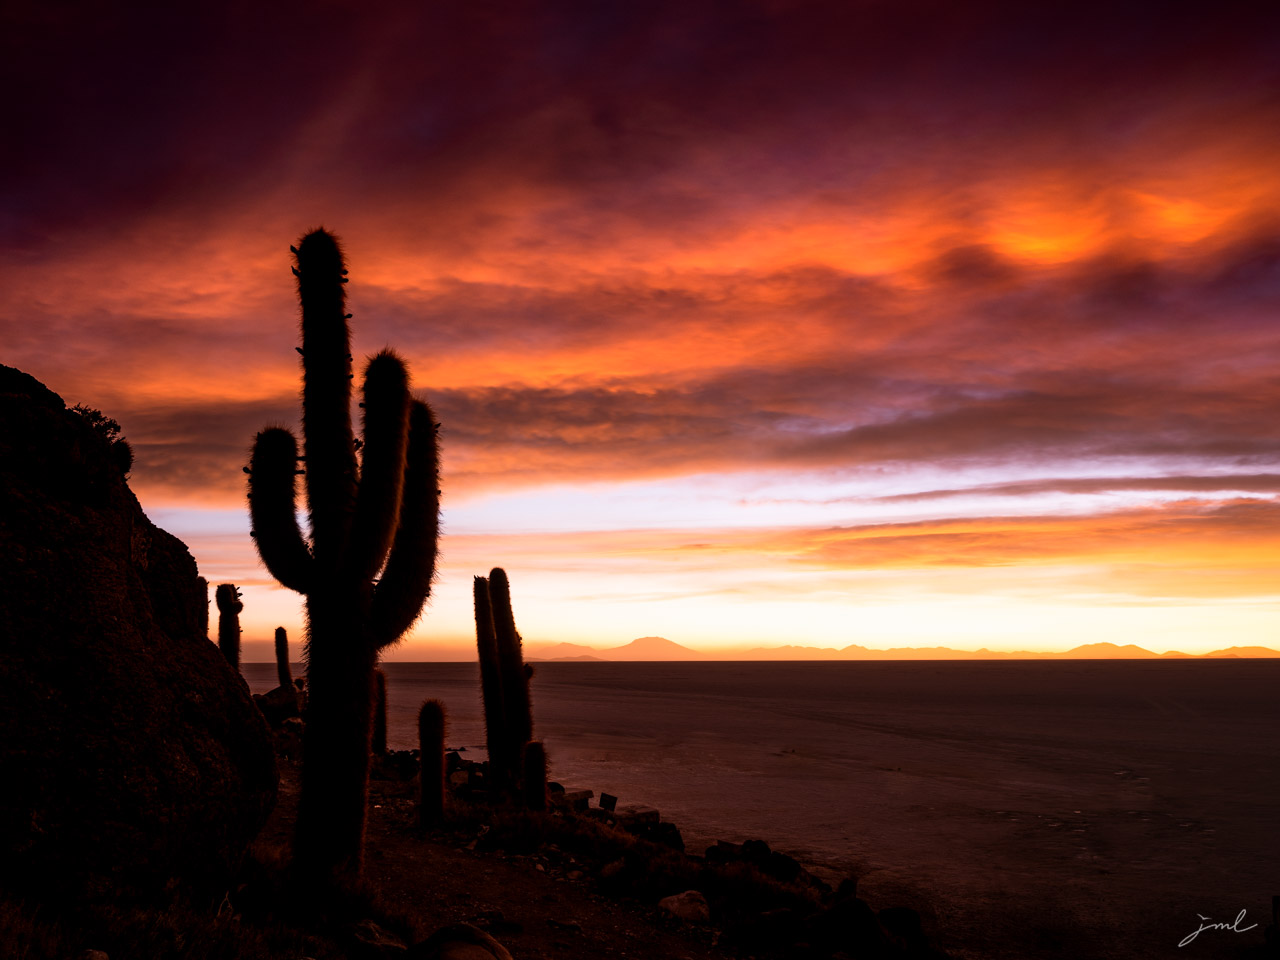 Paysage du desert de l'ATACAMA